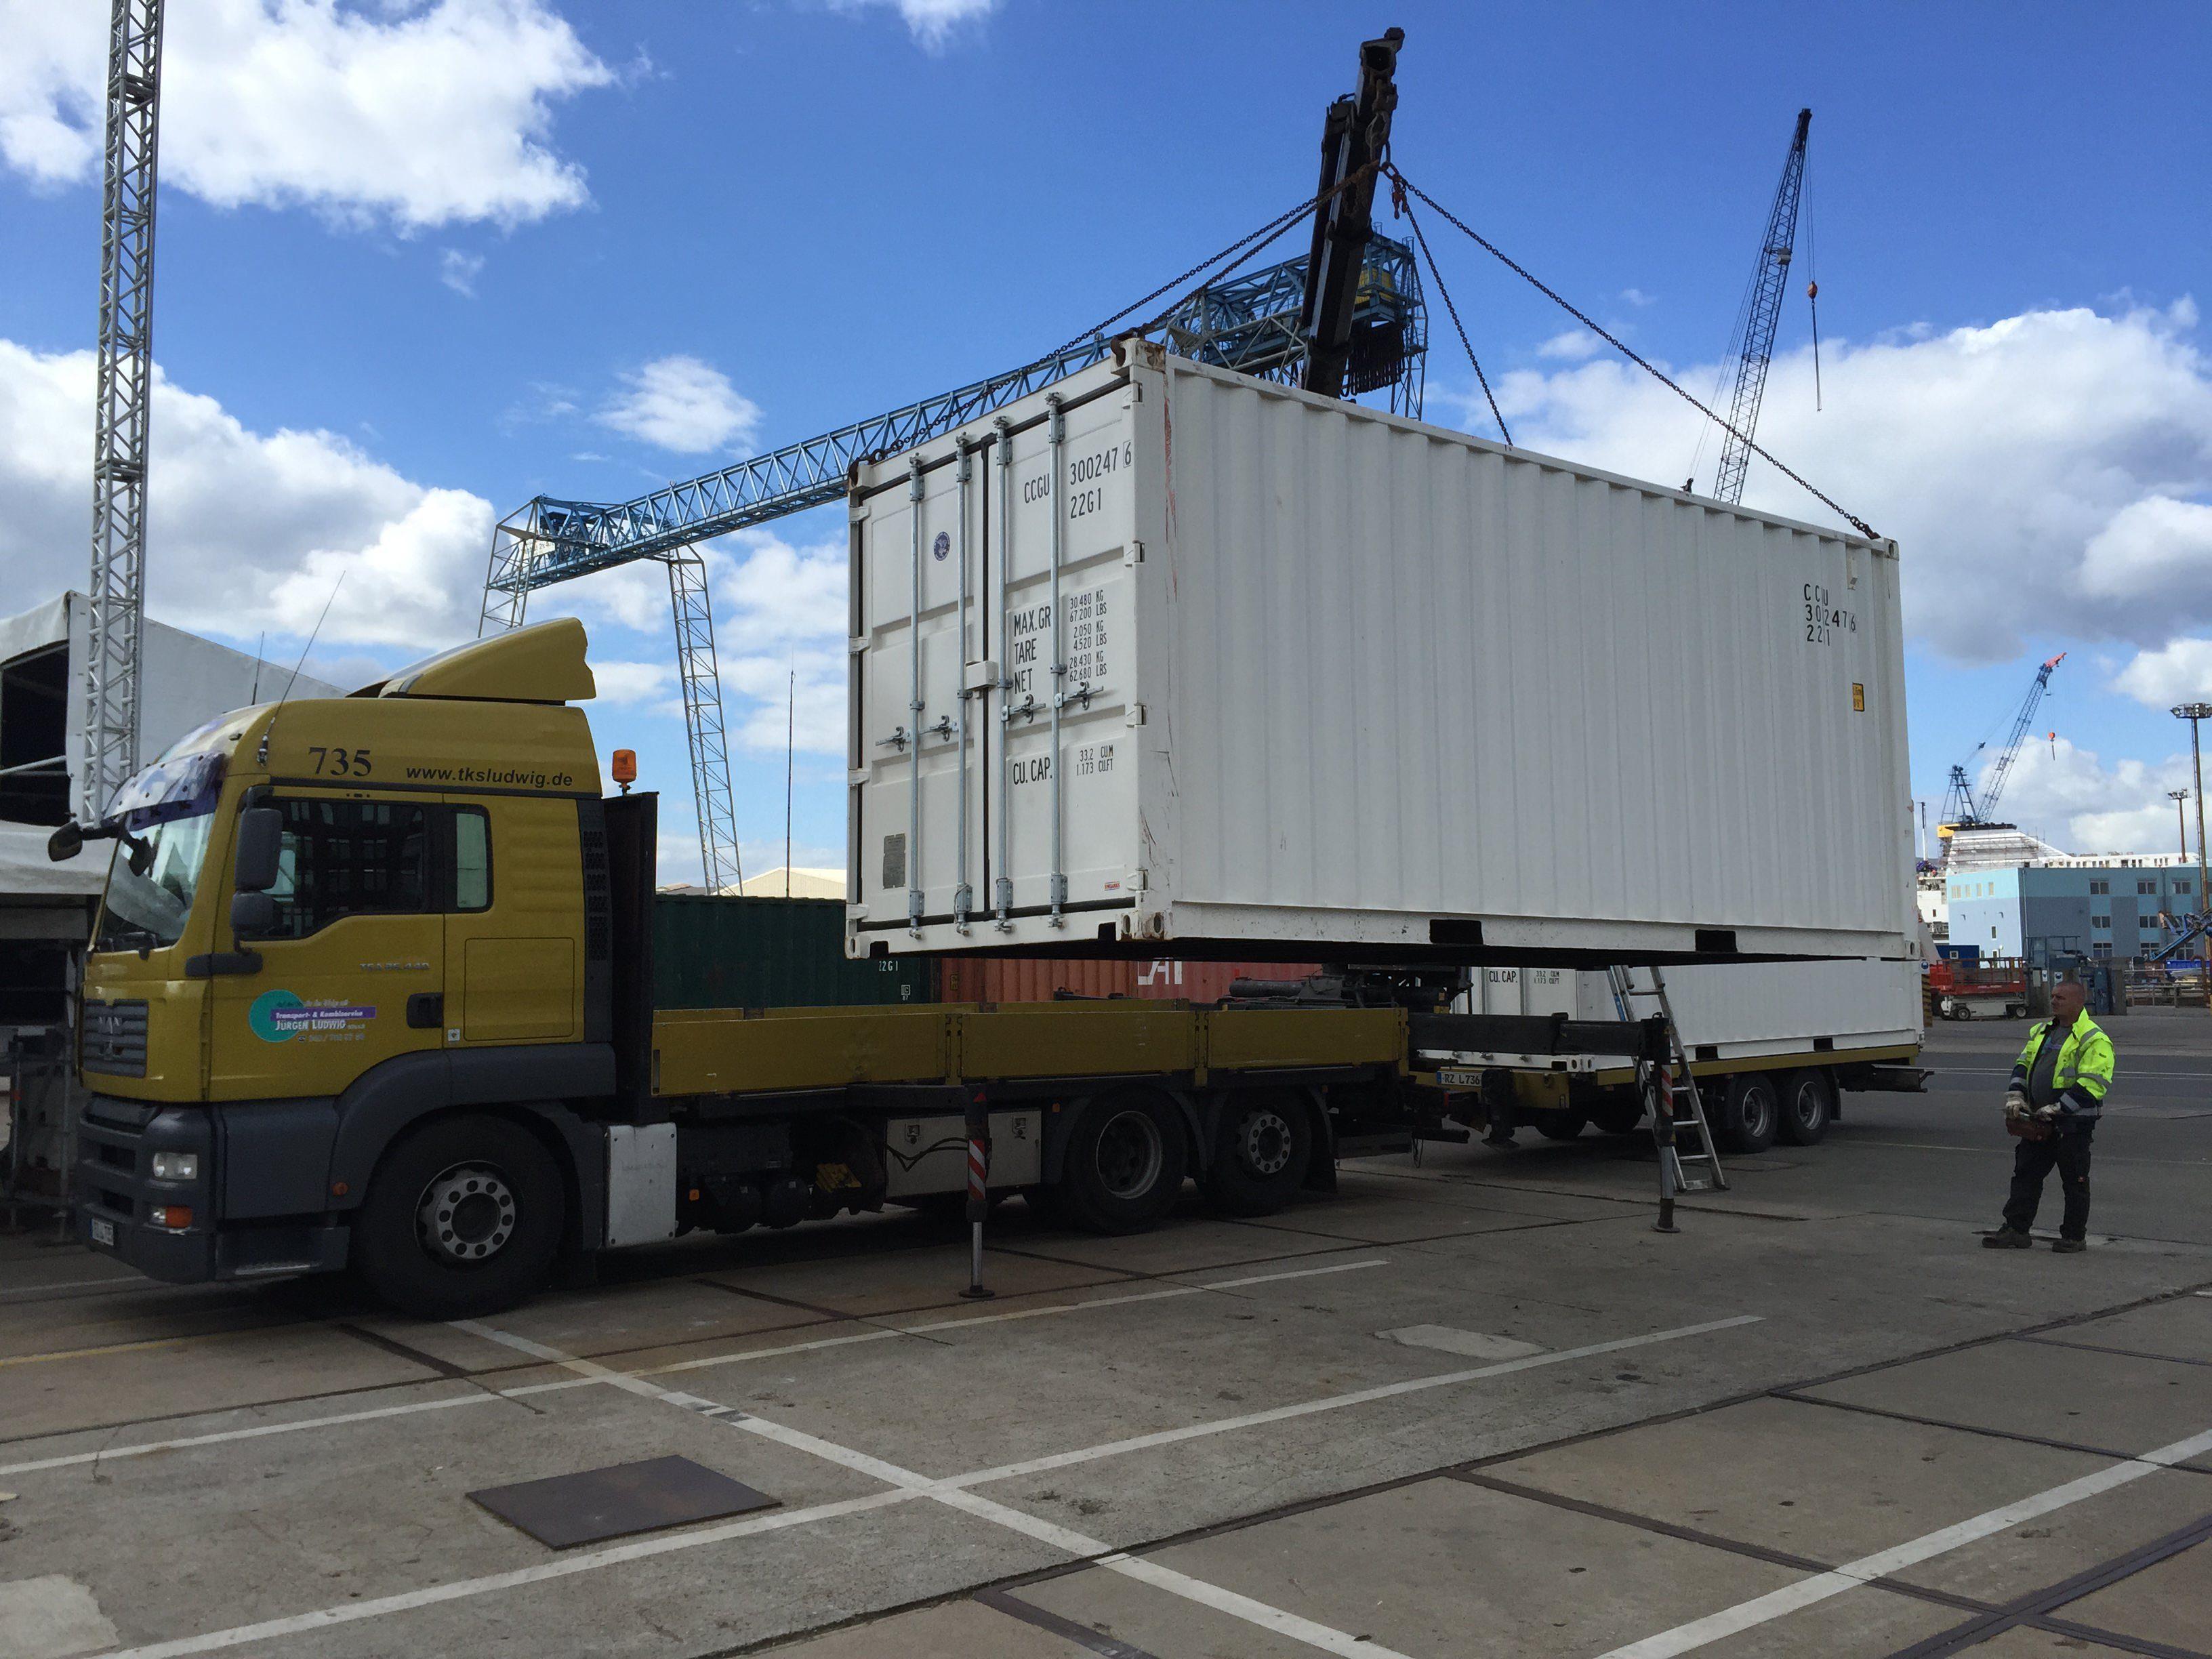 Top Container abladen - so wird es gemacht! - Containerbasis.de &RS_43